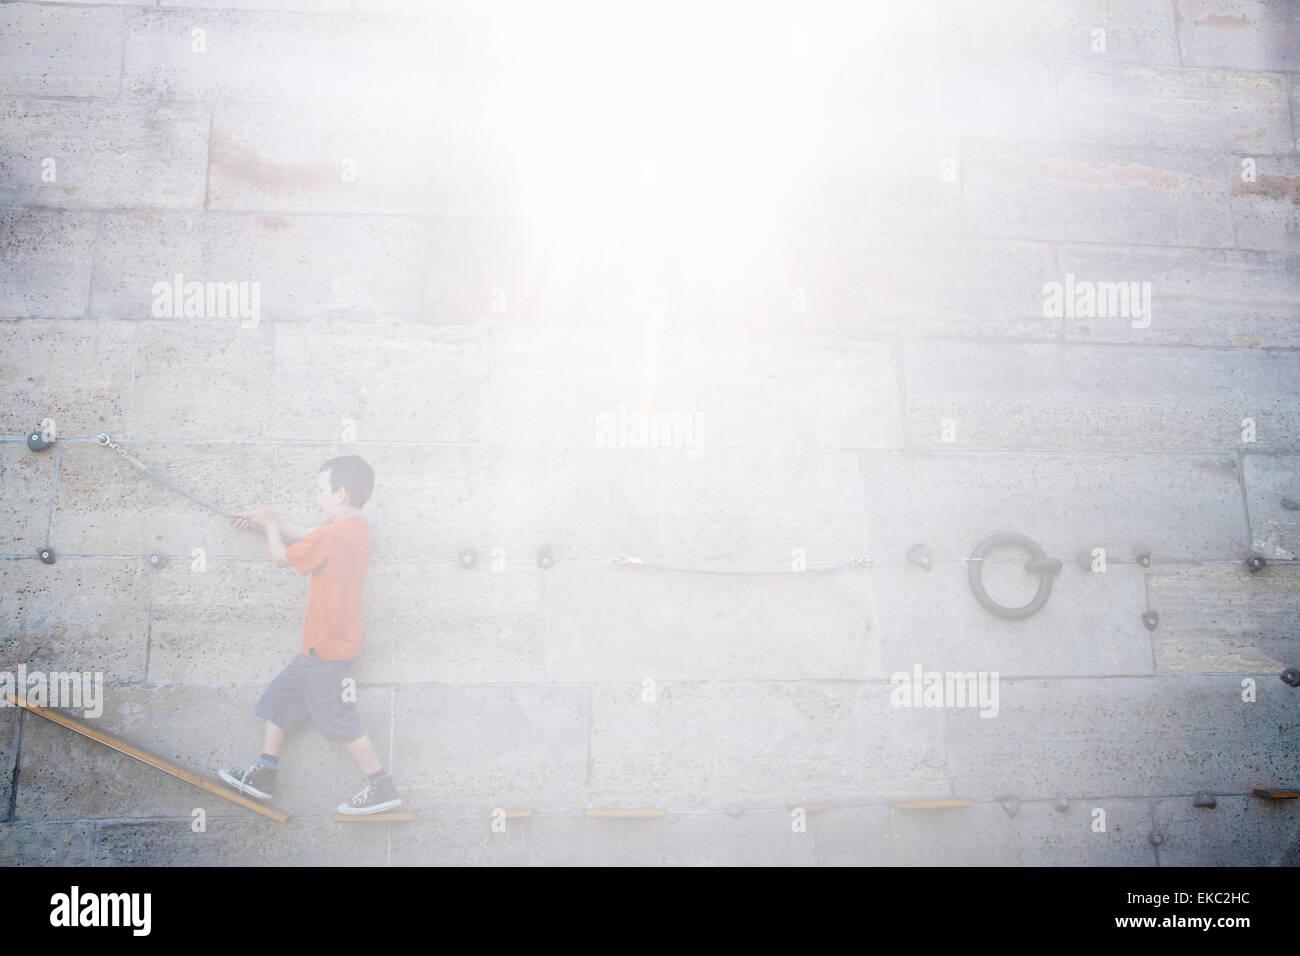 Boy climbing along wall - Stock Image